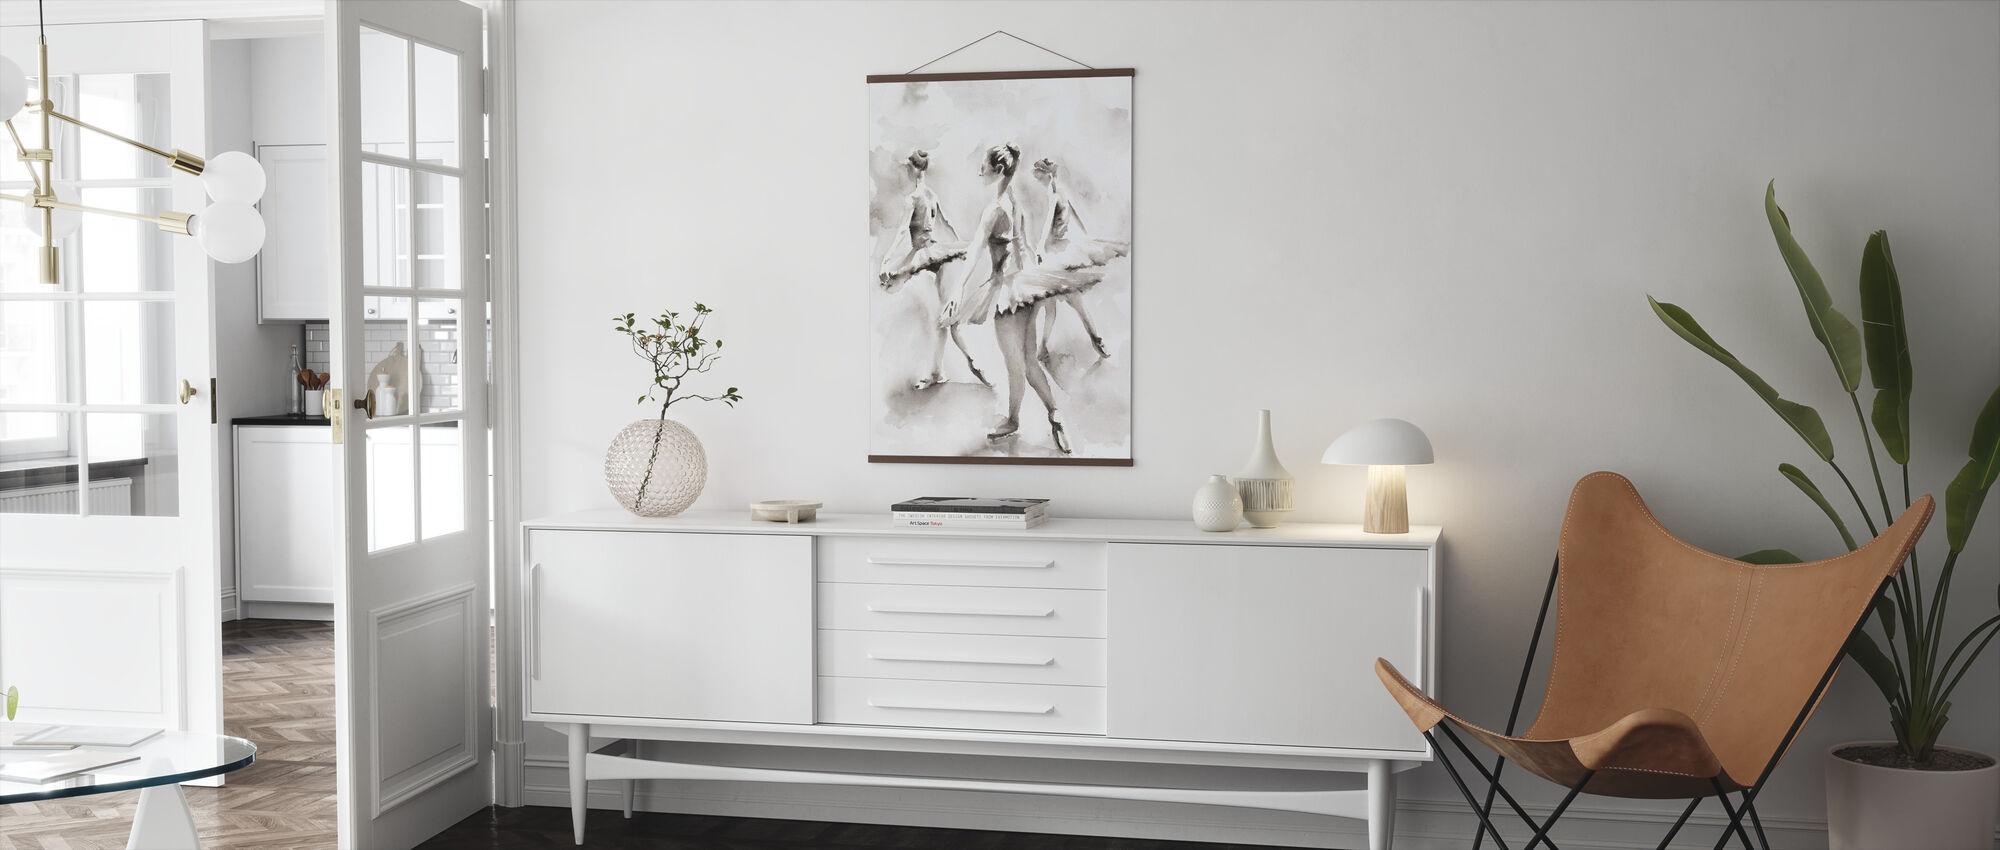 Kolme ballerinaa - Juliste - Olohuone